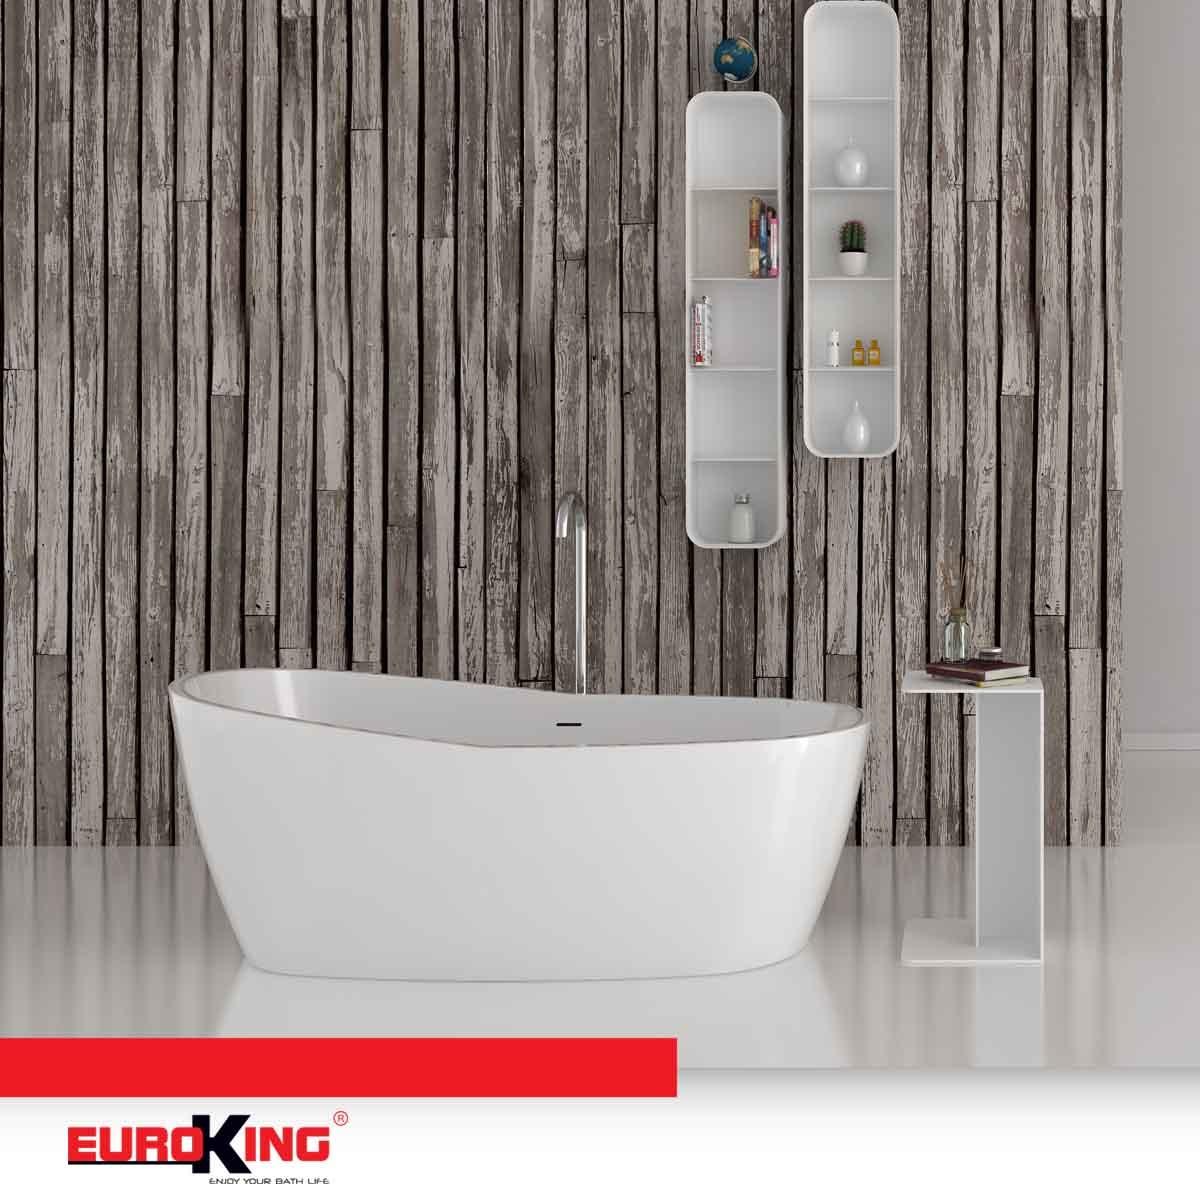 Bồn tắm Euroking LOUISE EU-6037